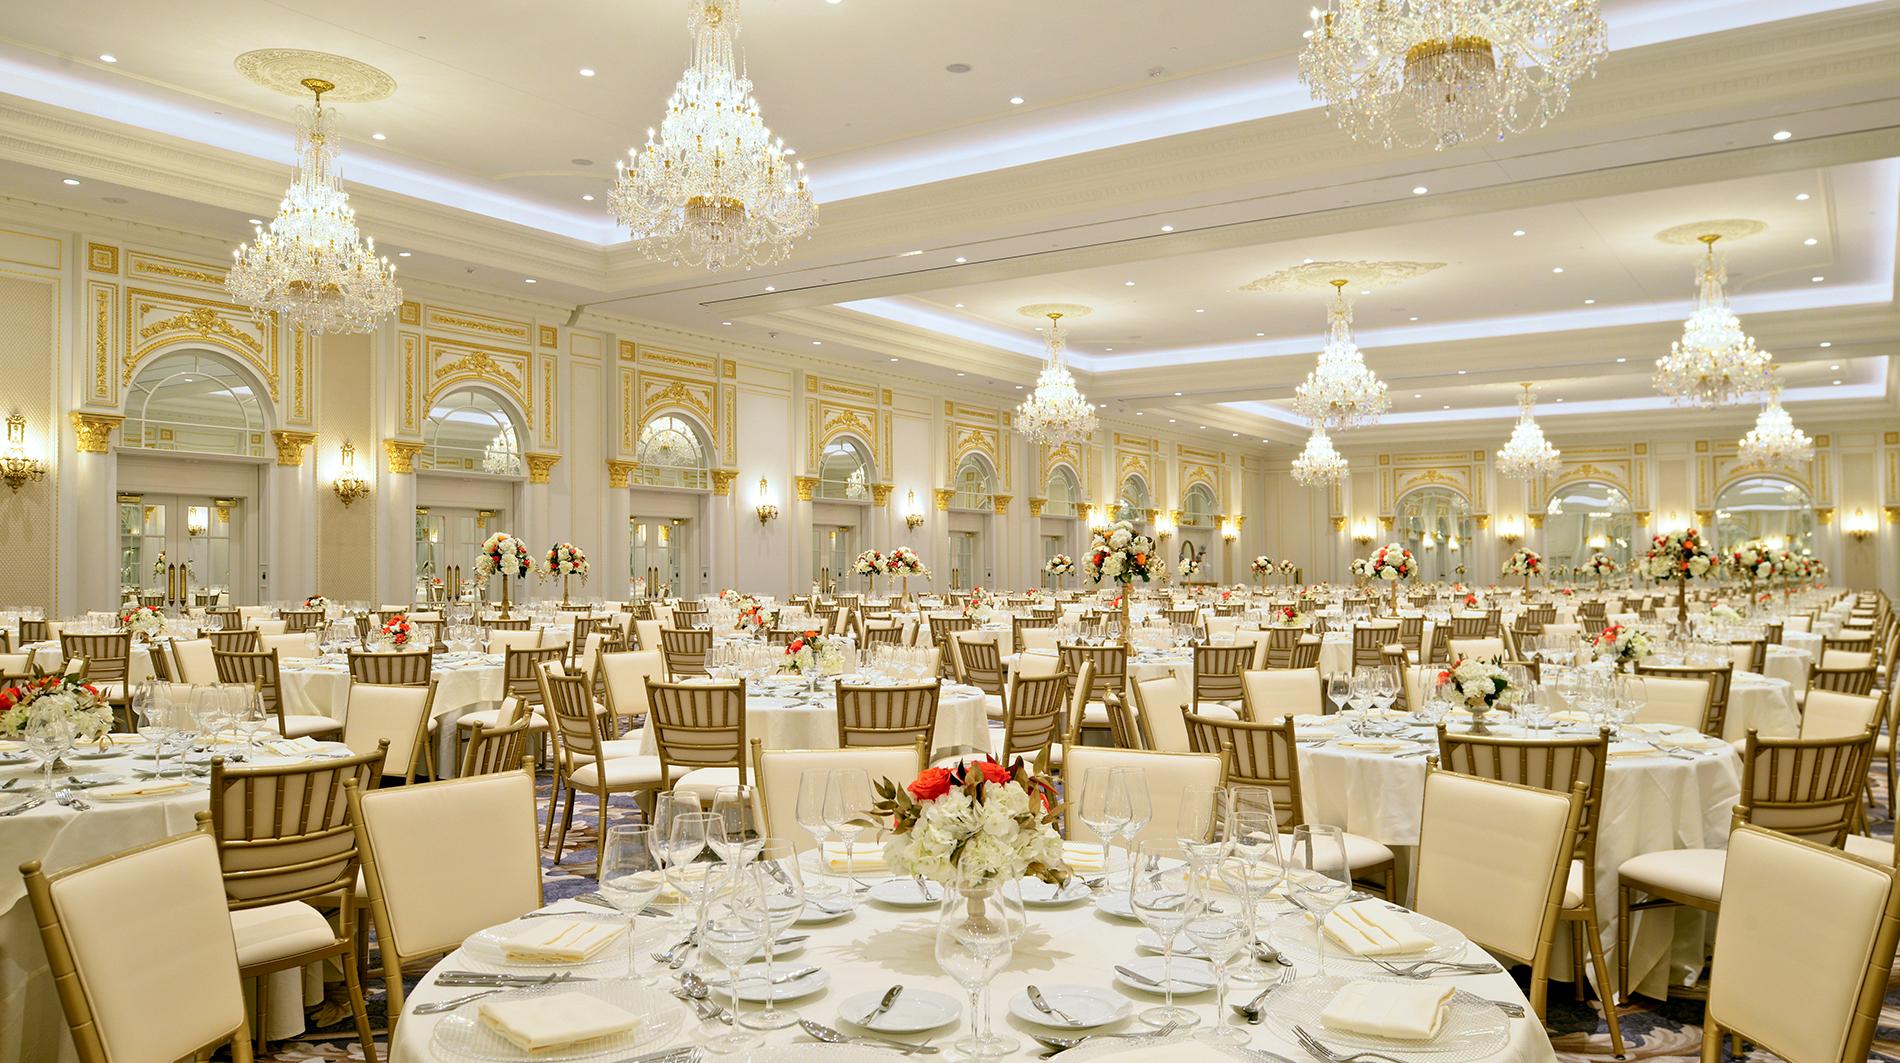 Trump international hotel washington dc Benjamin presidential ballroom